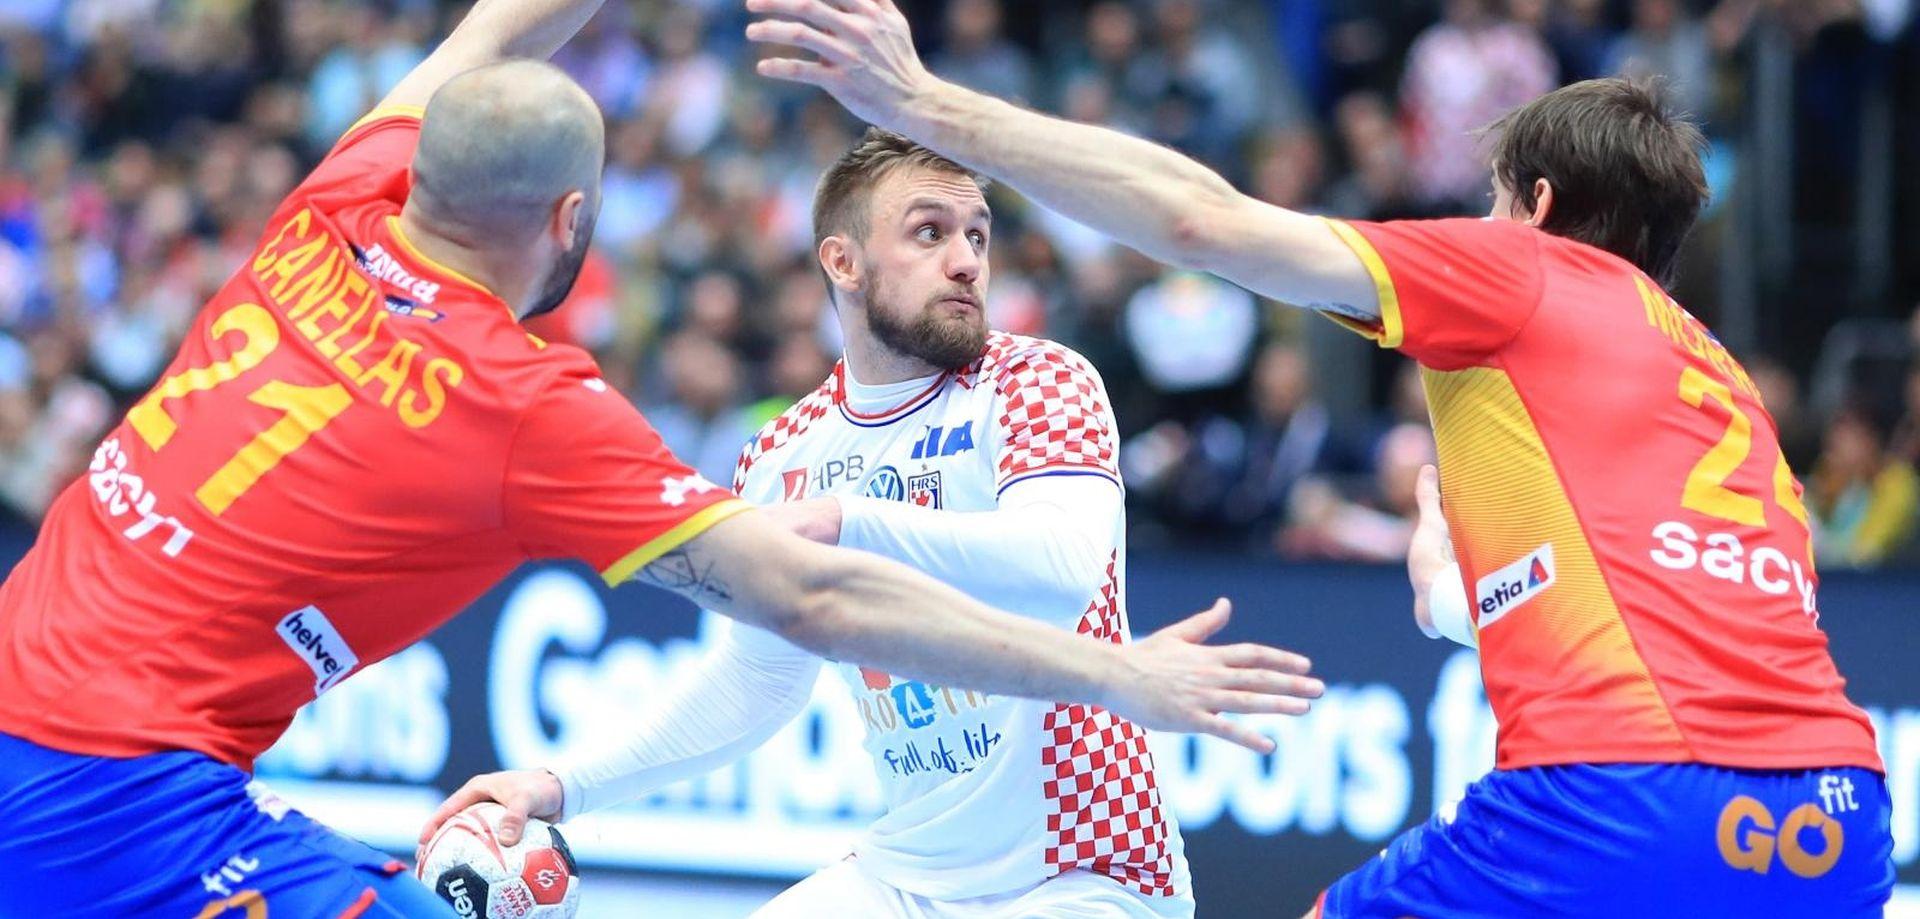 VELIKI UDARAC Cindrić otpao do kraja turnira